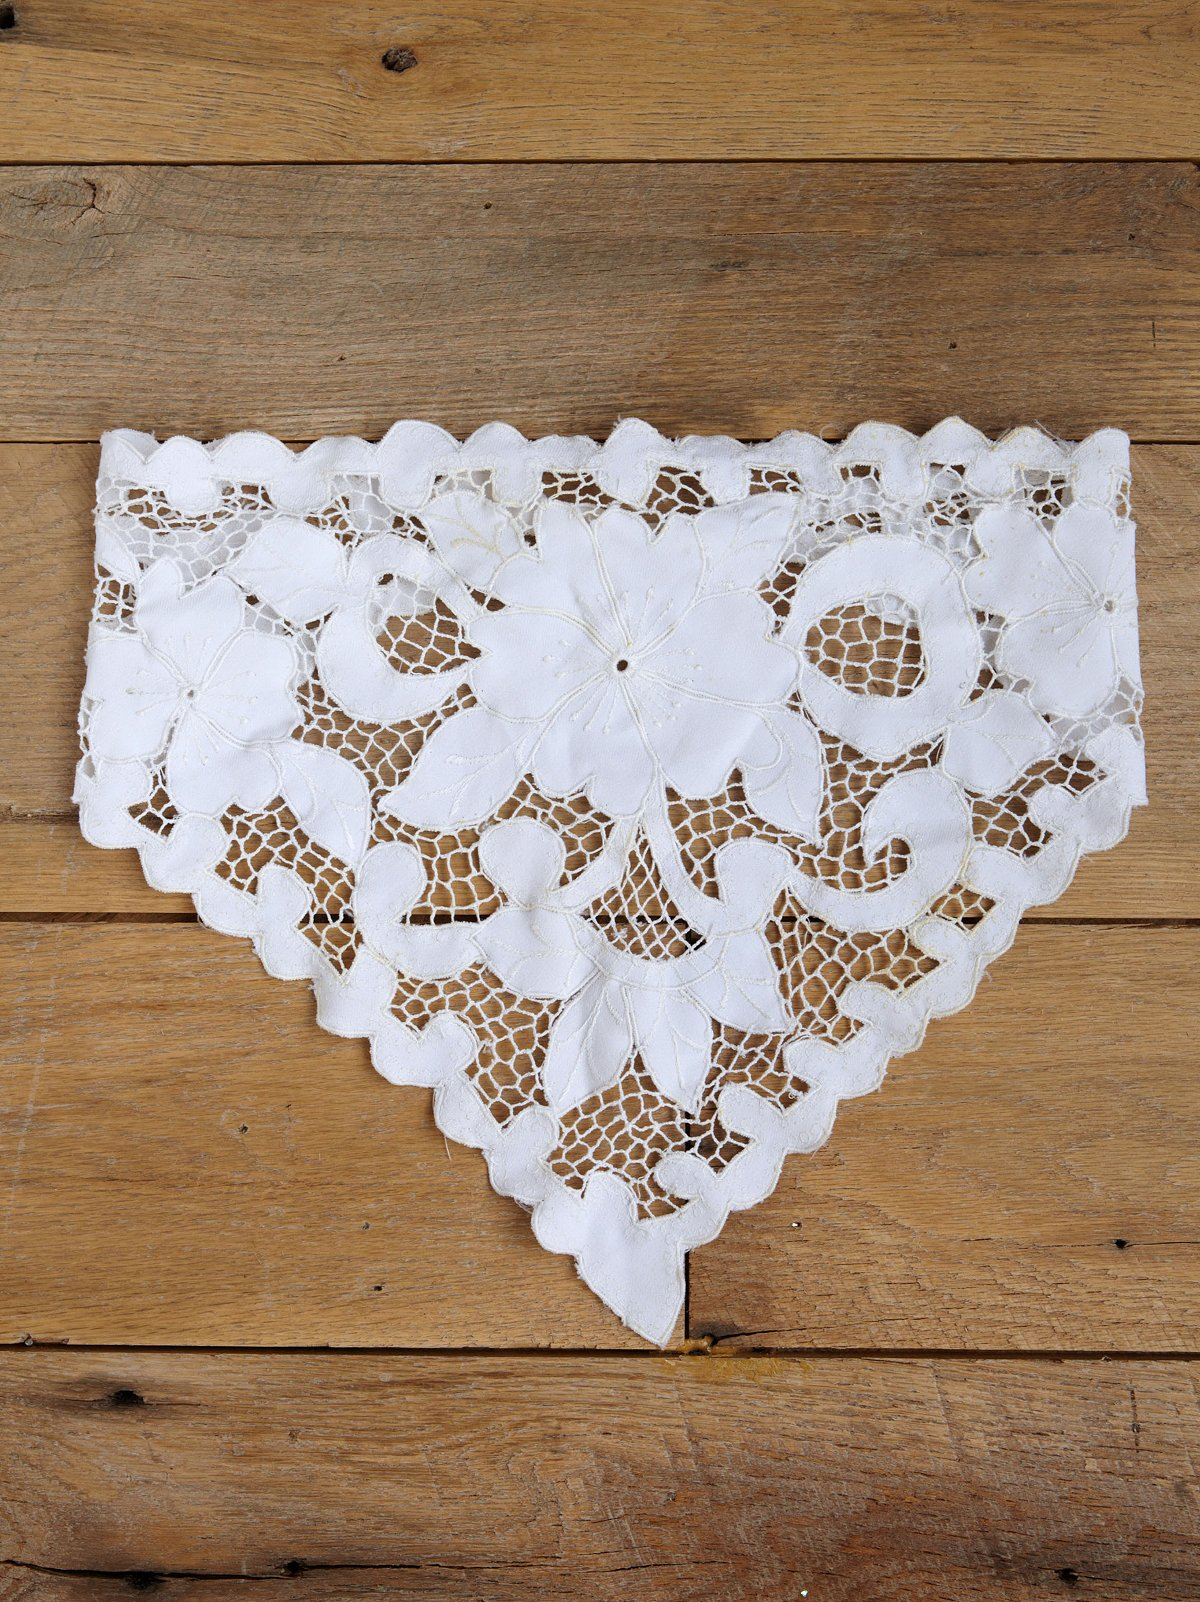 Vintage White Cotton Embroidered Handkerchief